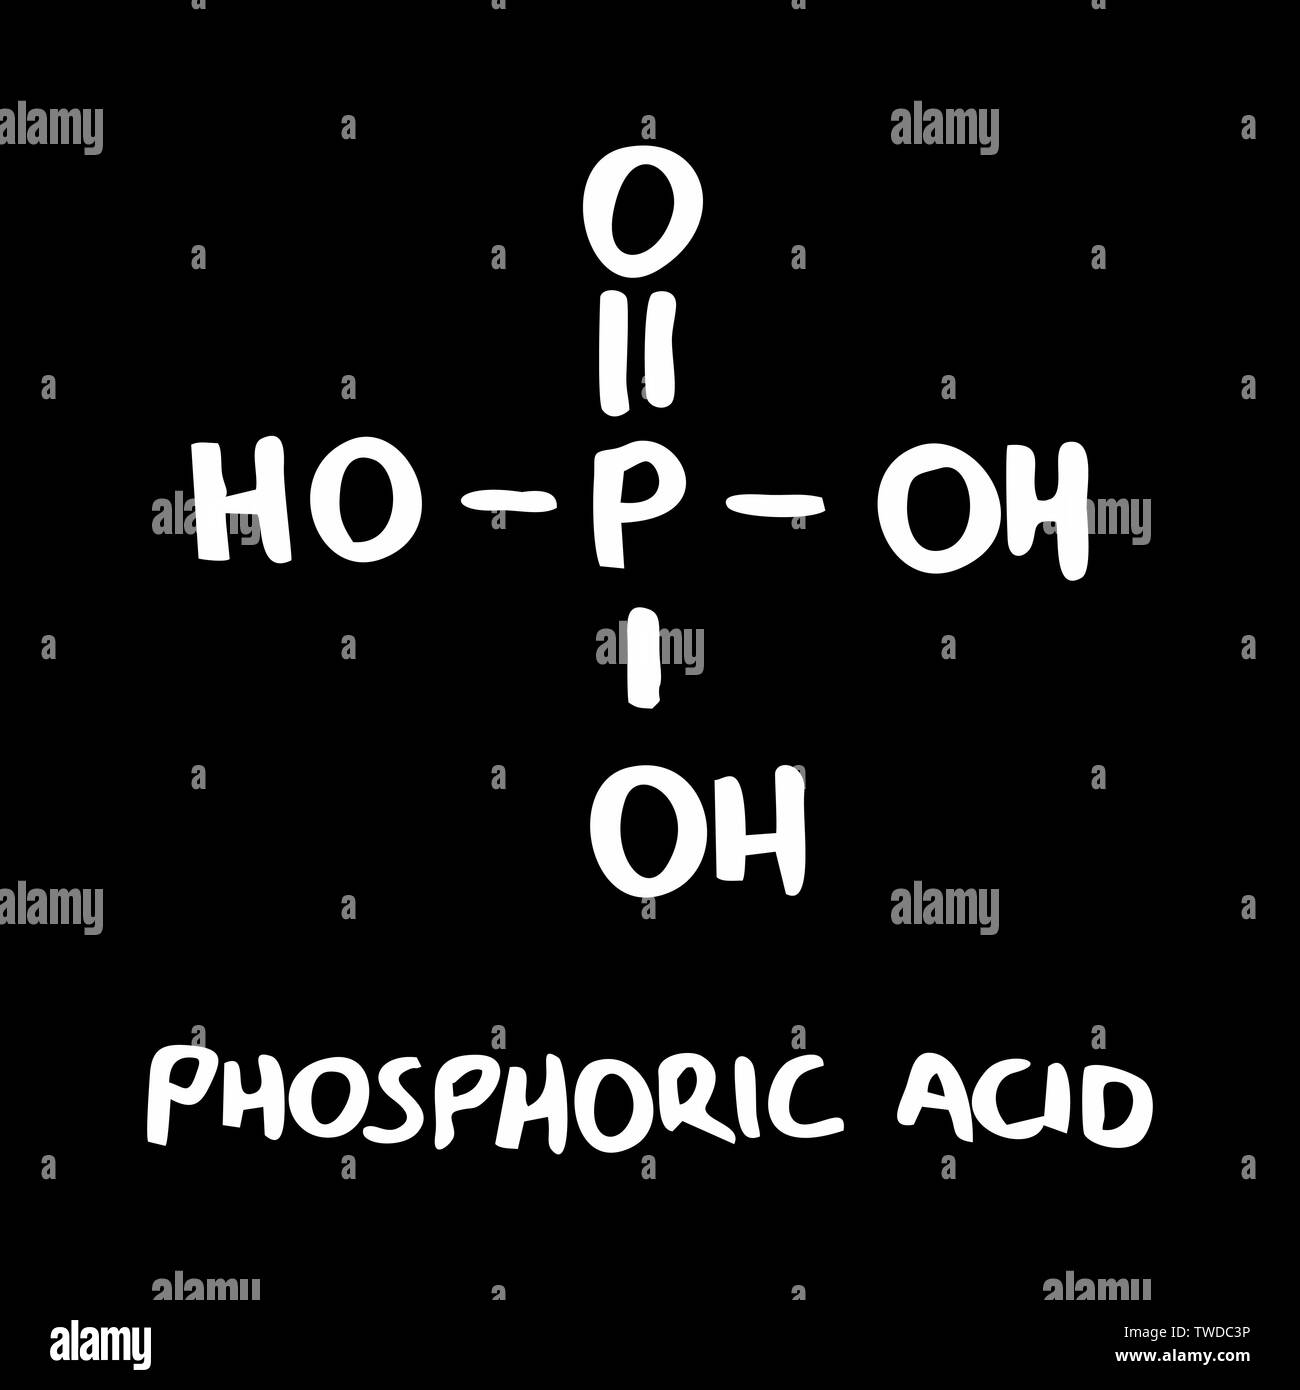 Phosphoric Acid Molecule Stock Photos & Phosphoric Acid Molecule